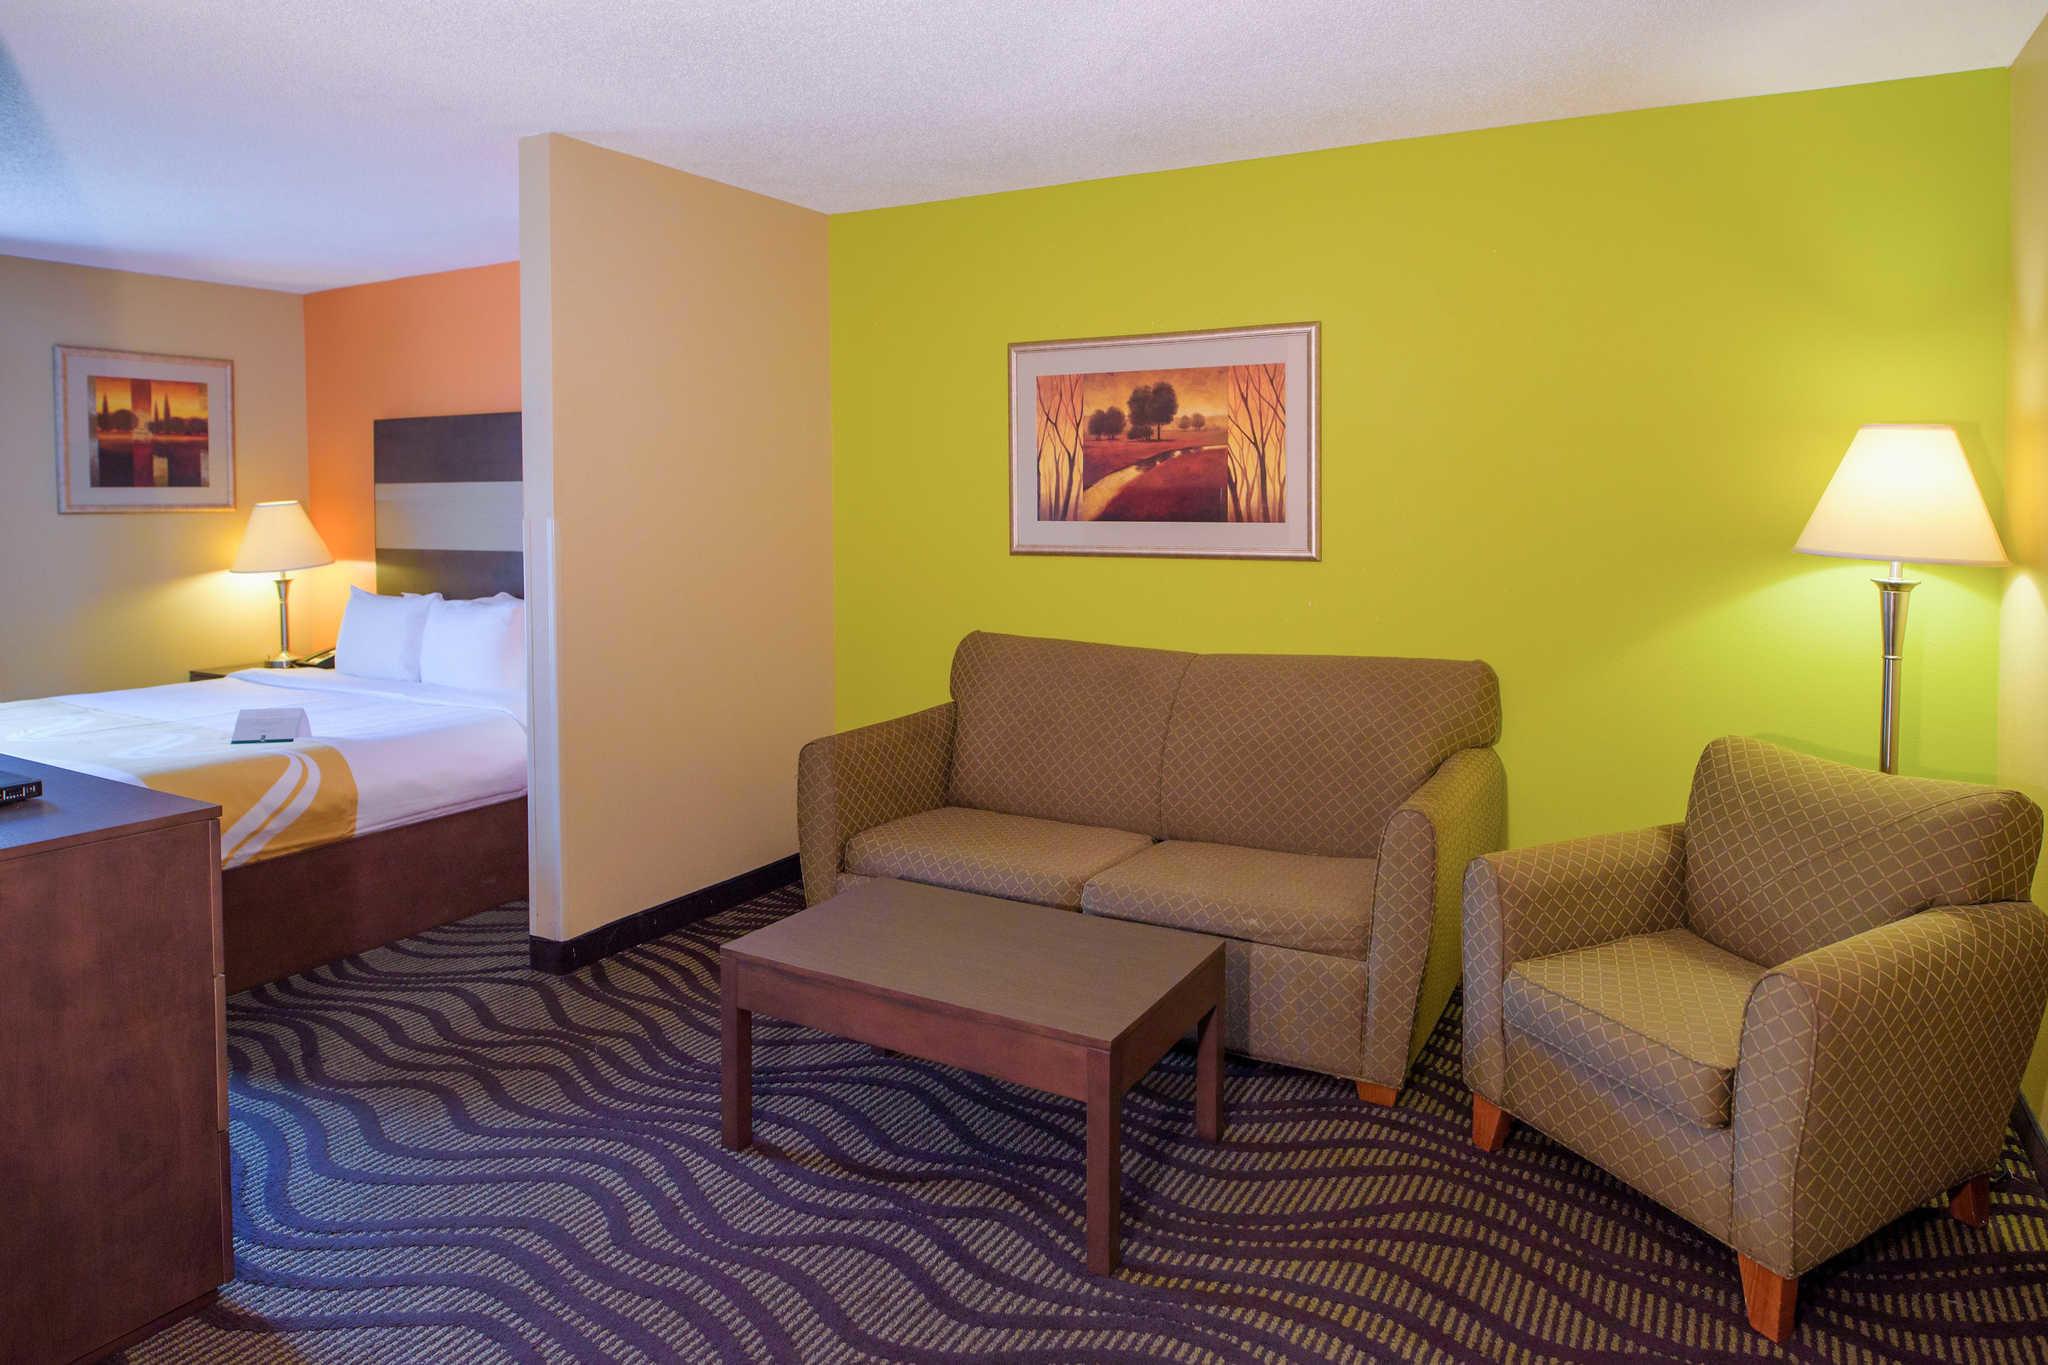 Quality Suites Near Wolfchase Galleria 8166 Varnavas Dr Cordova Tn 38016 Yp